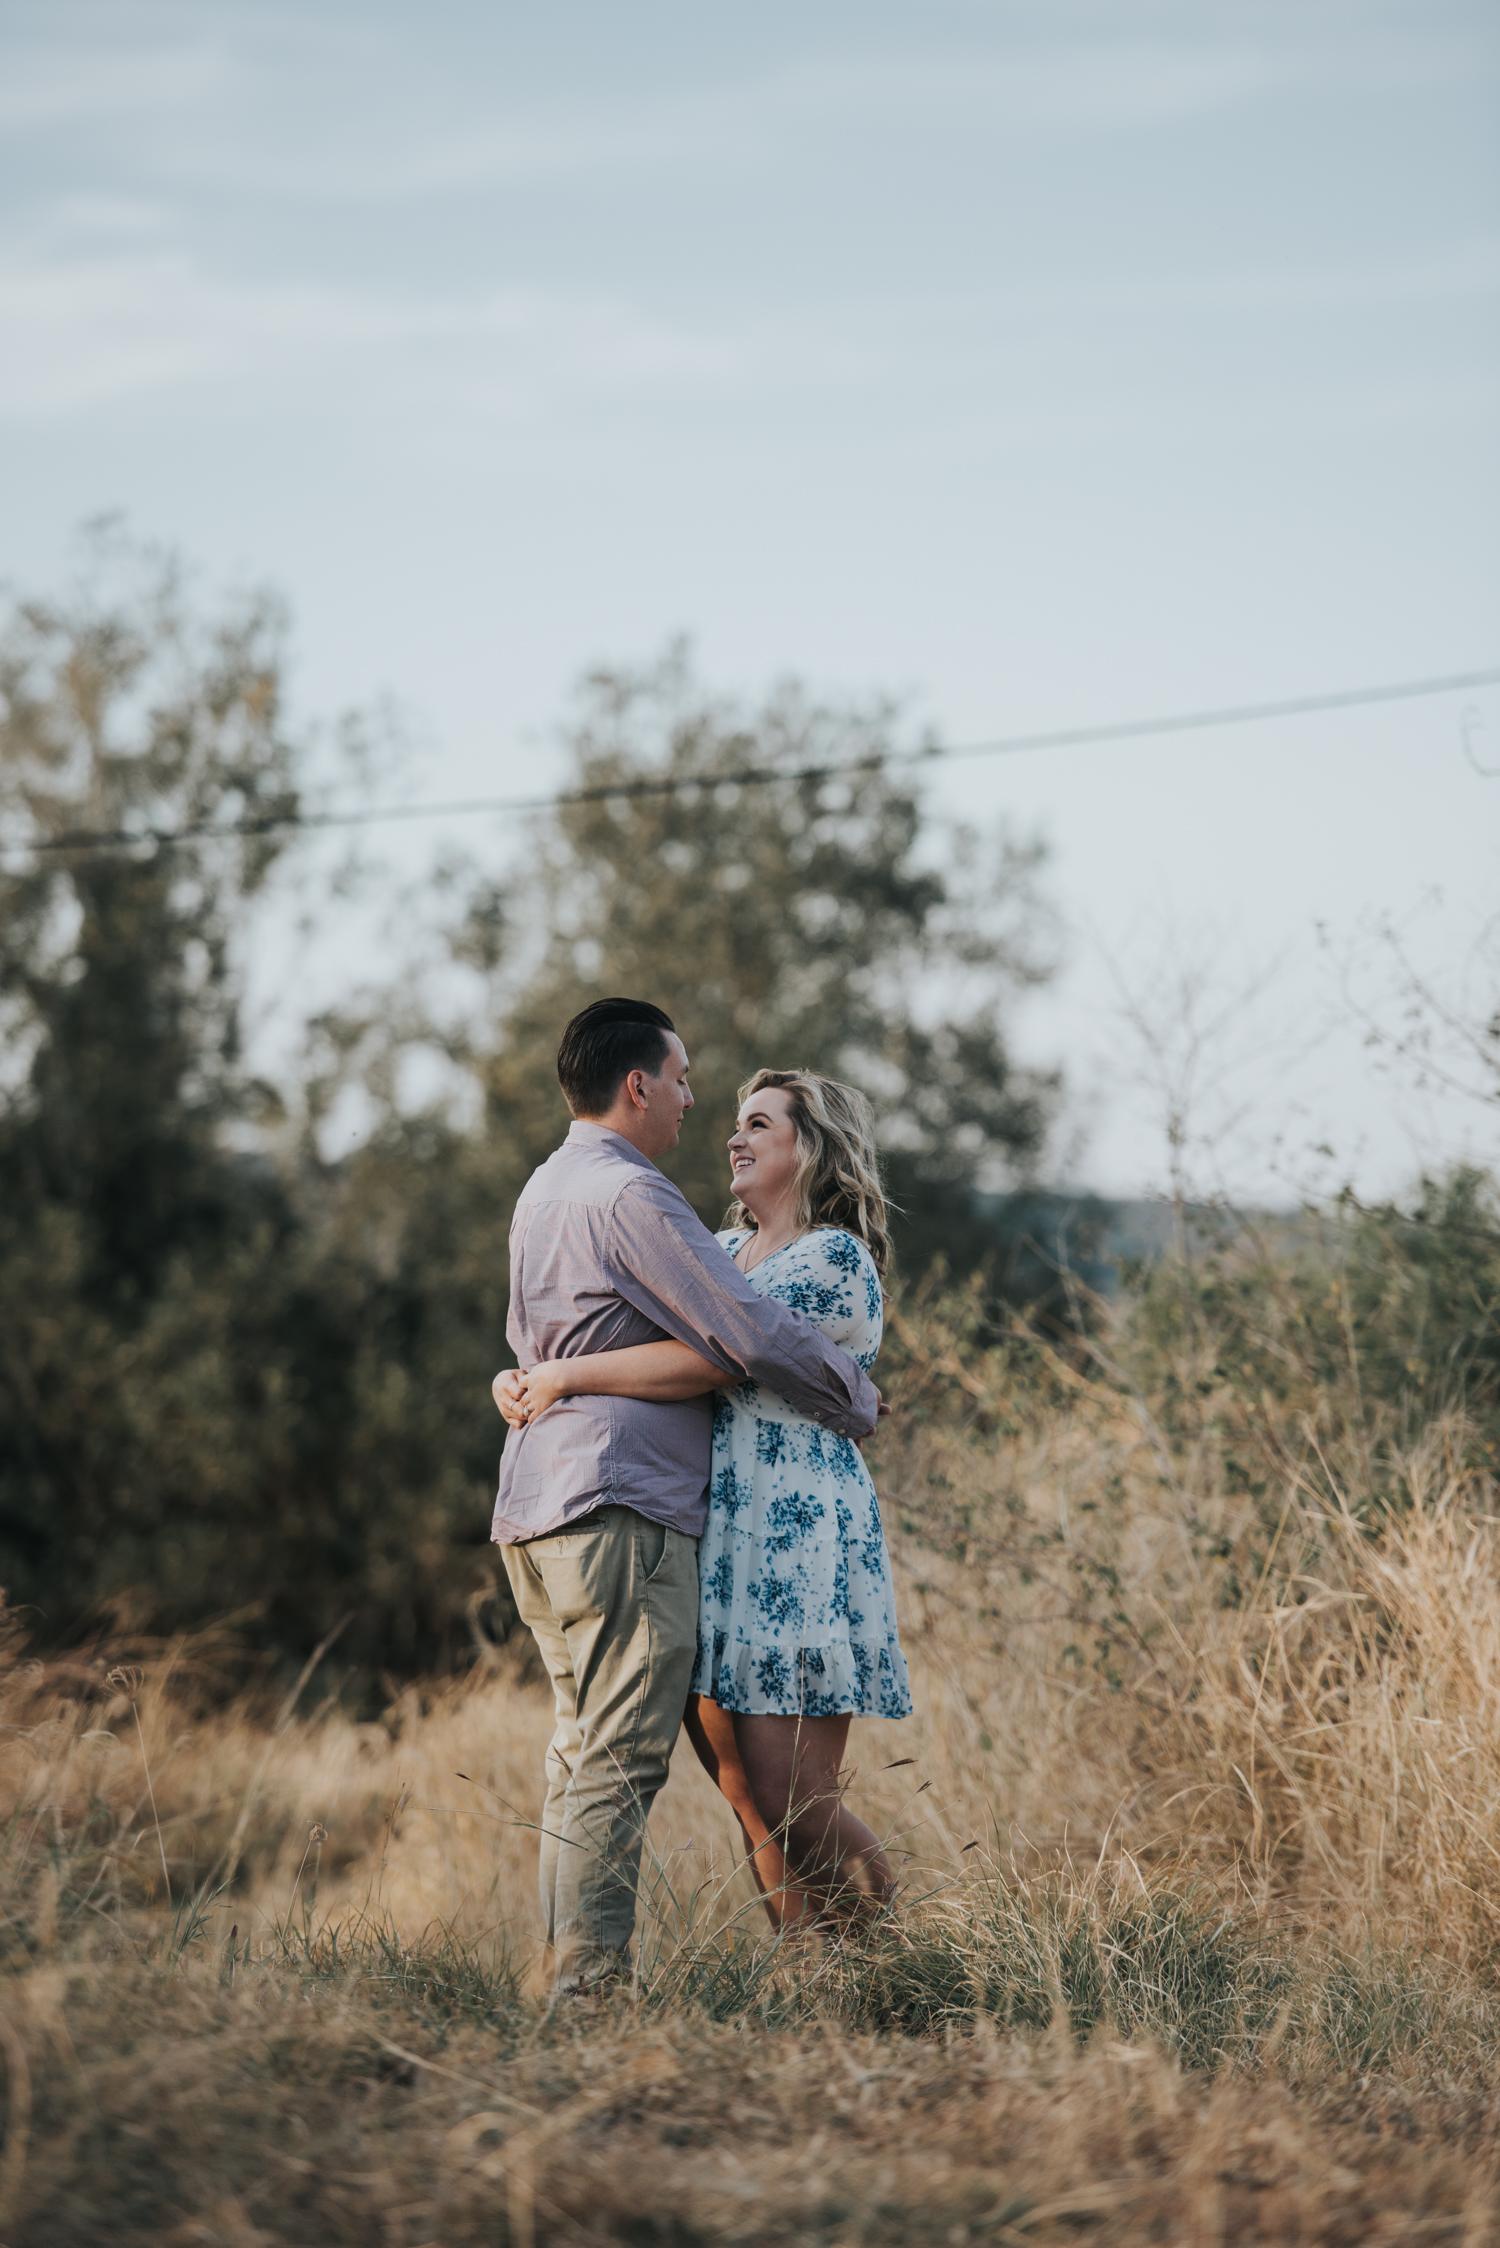 Brisbane Engagement Photography | Wedding Photographer Brisbane-9.jpg